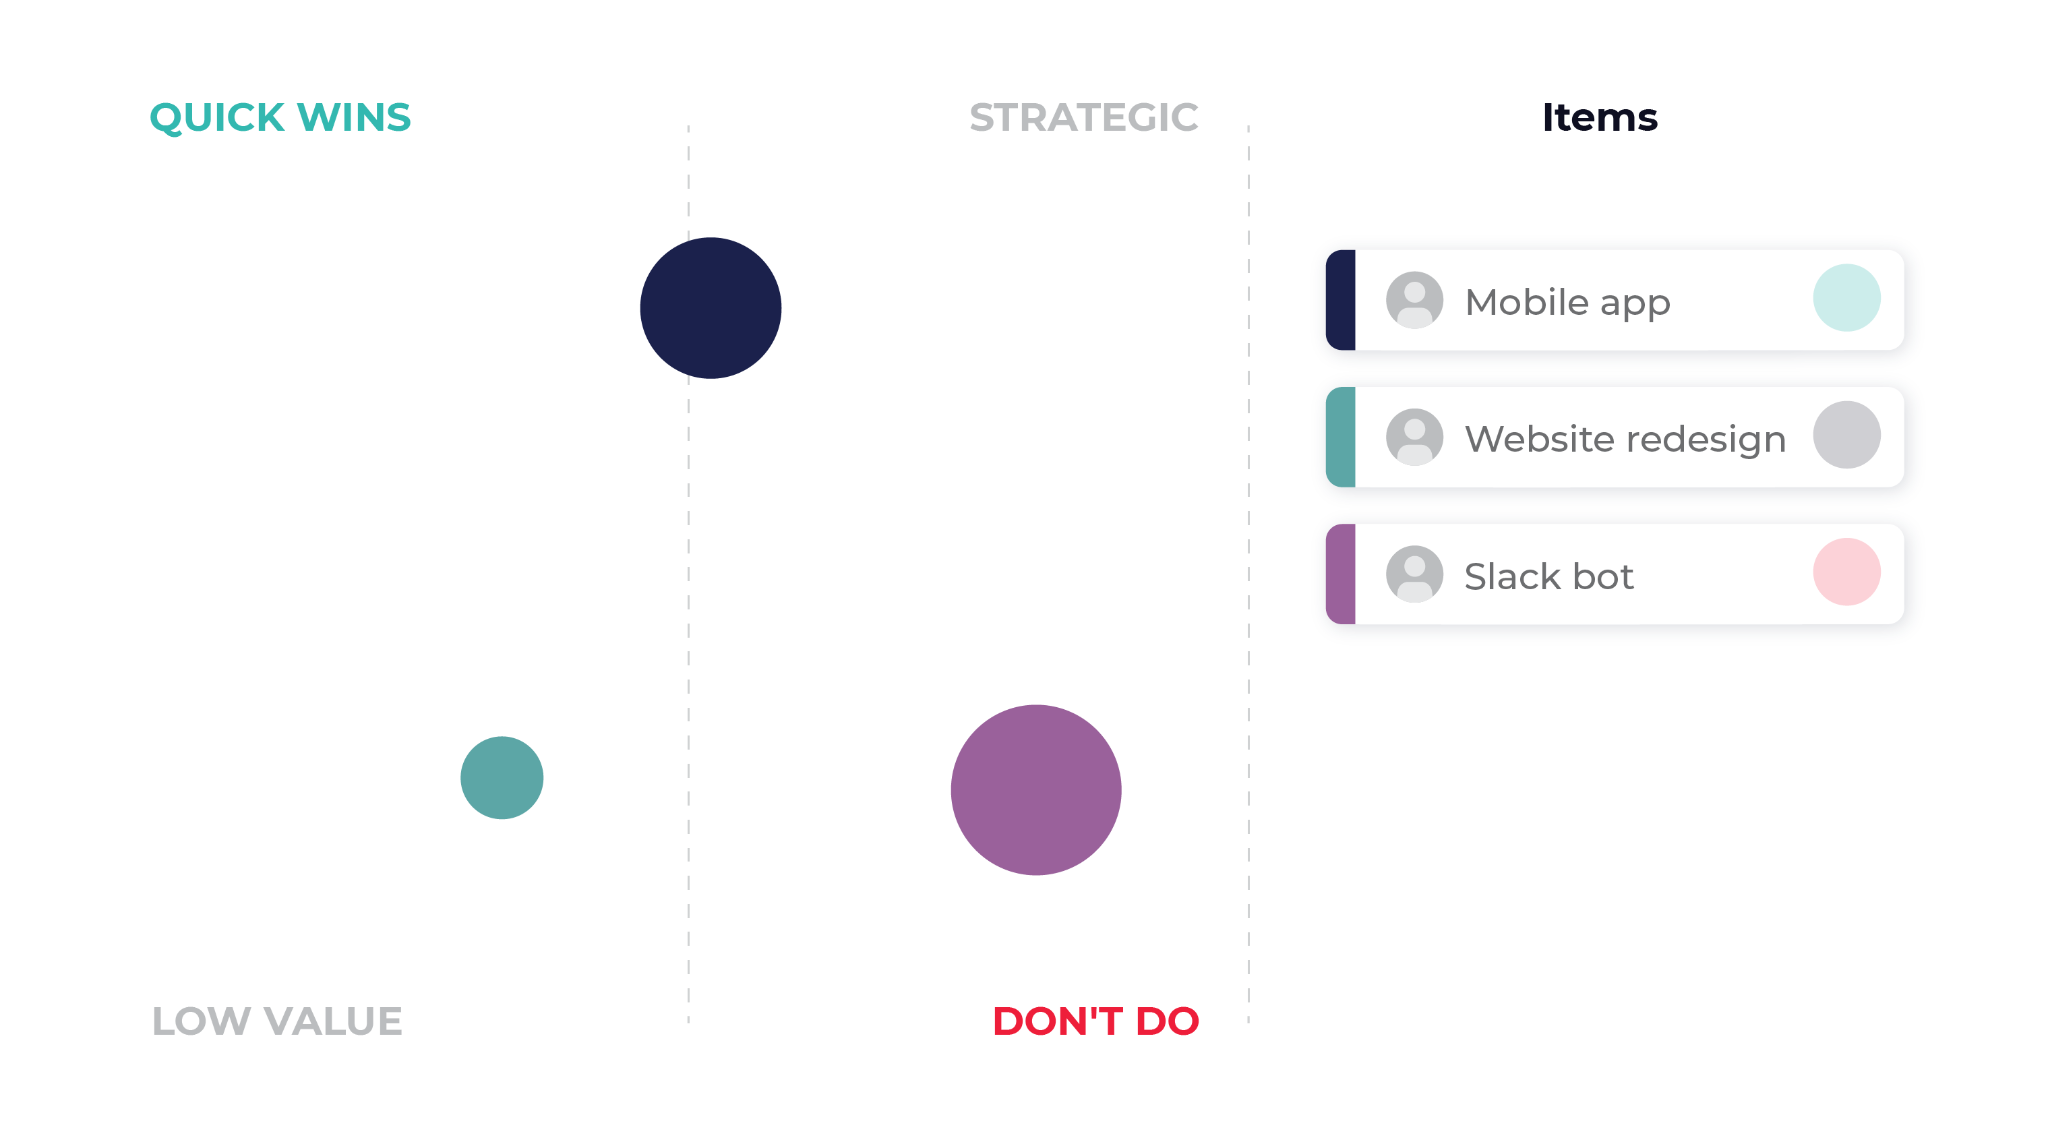 Chart view of a technology roadmap